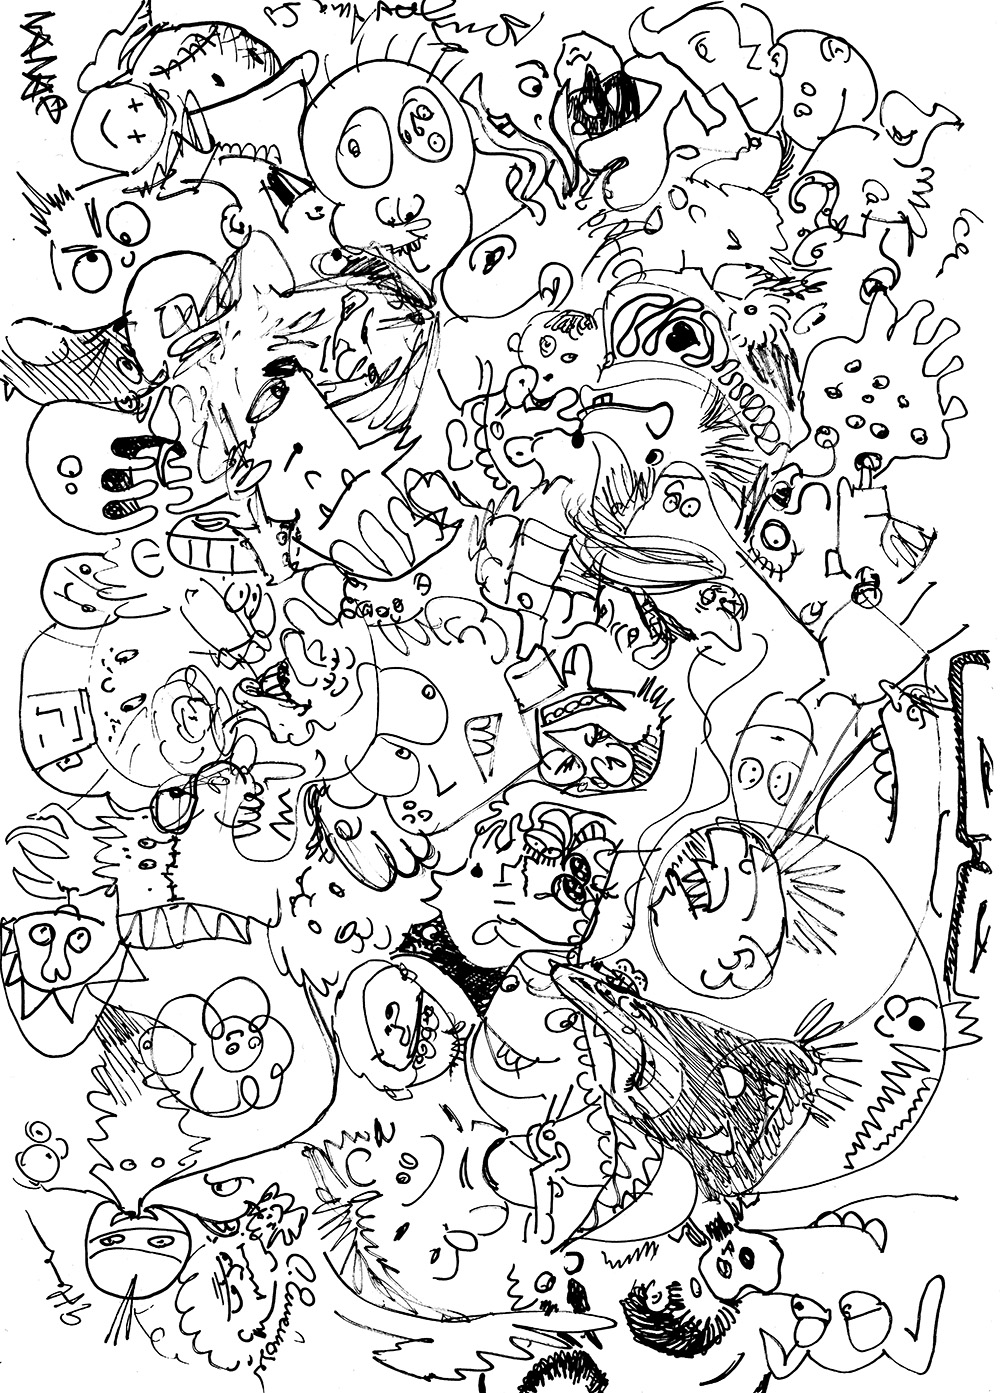 ComicJam 2015-06-10 1000px C